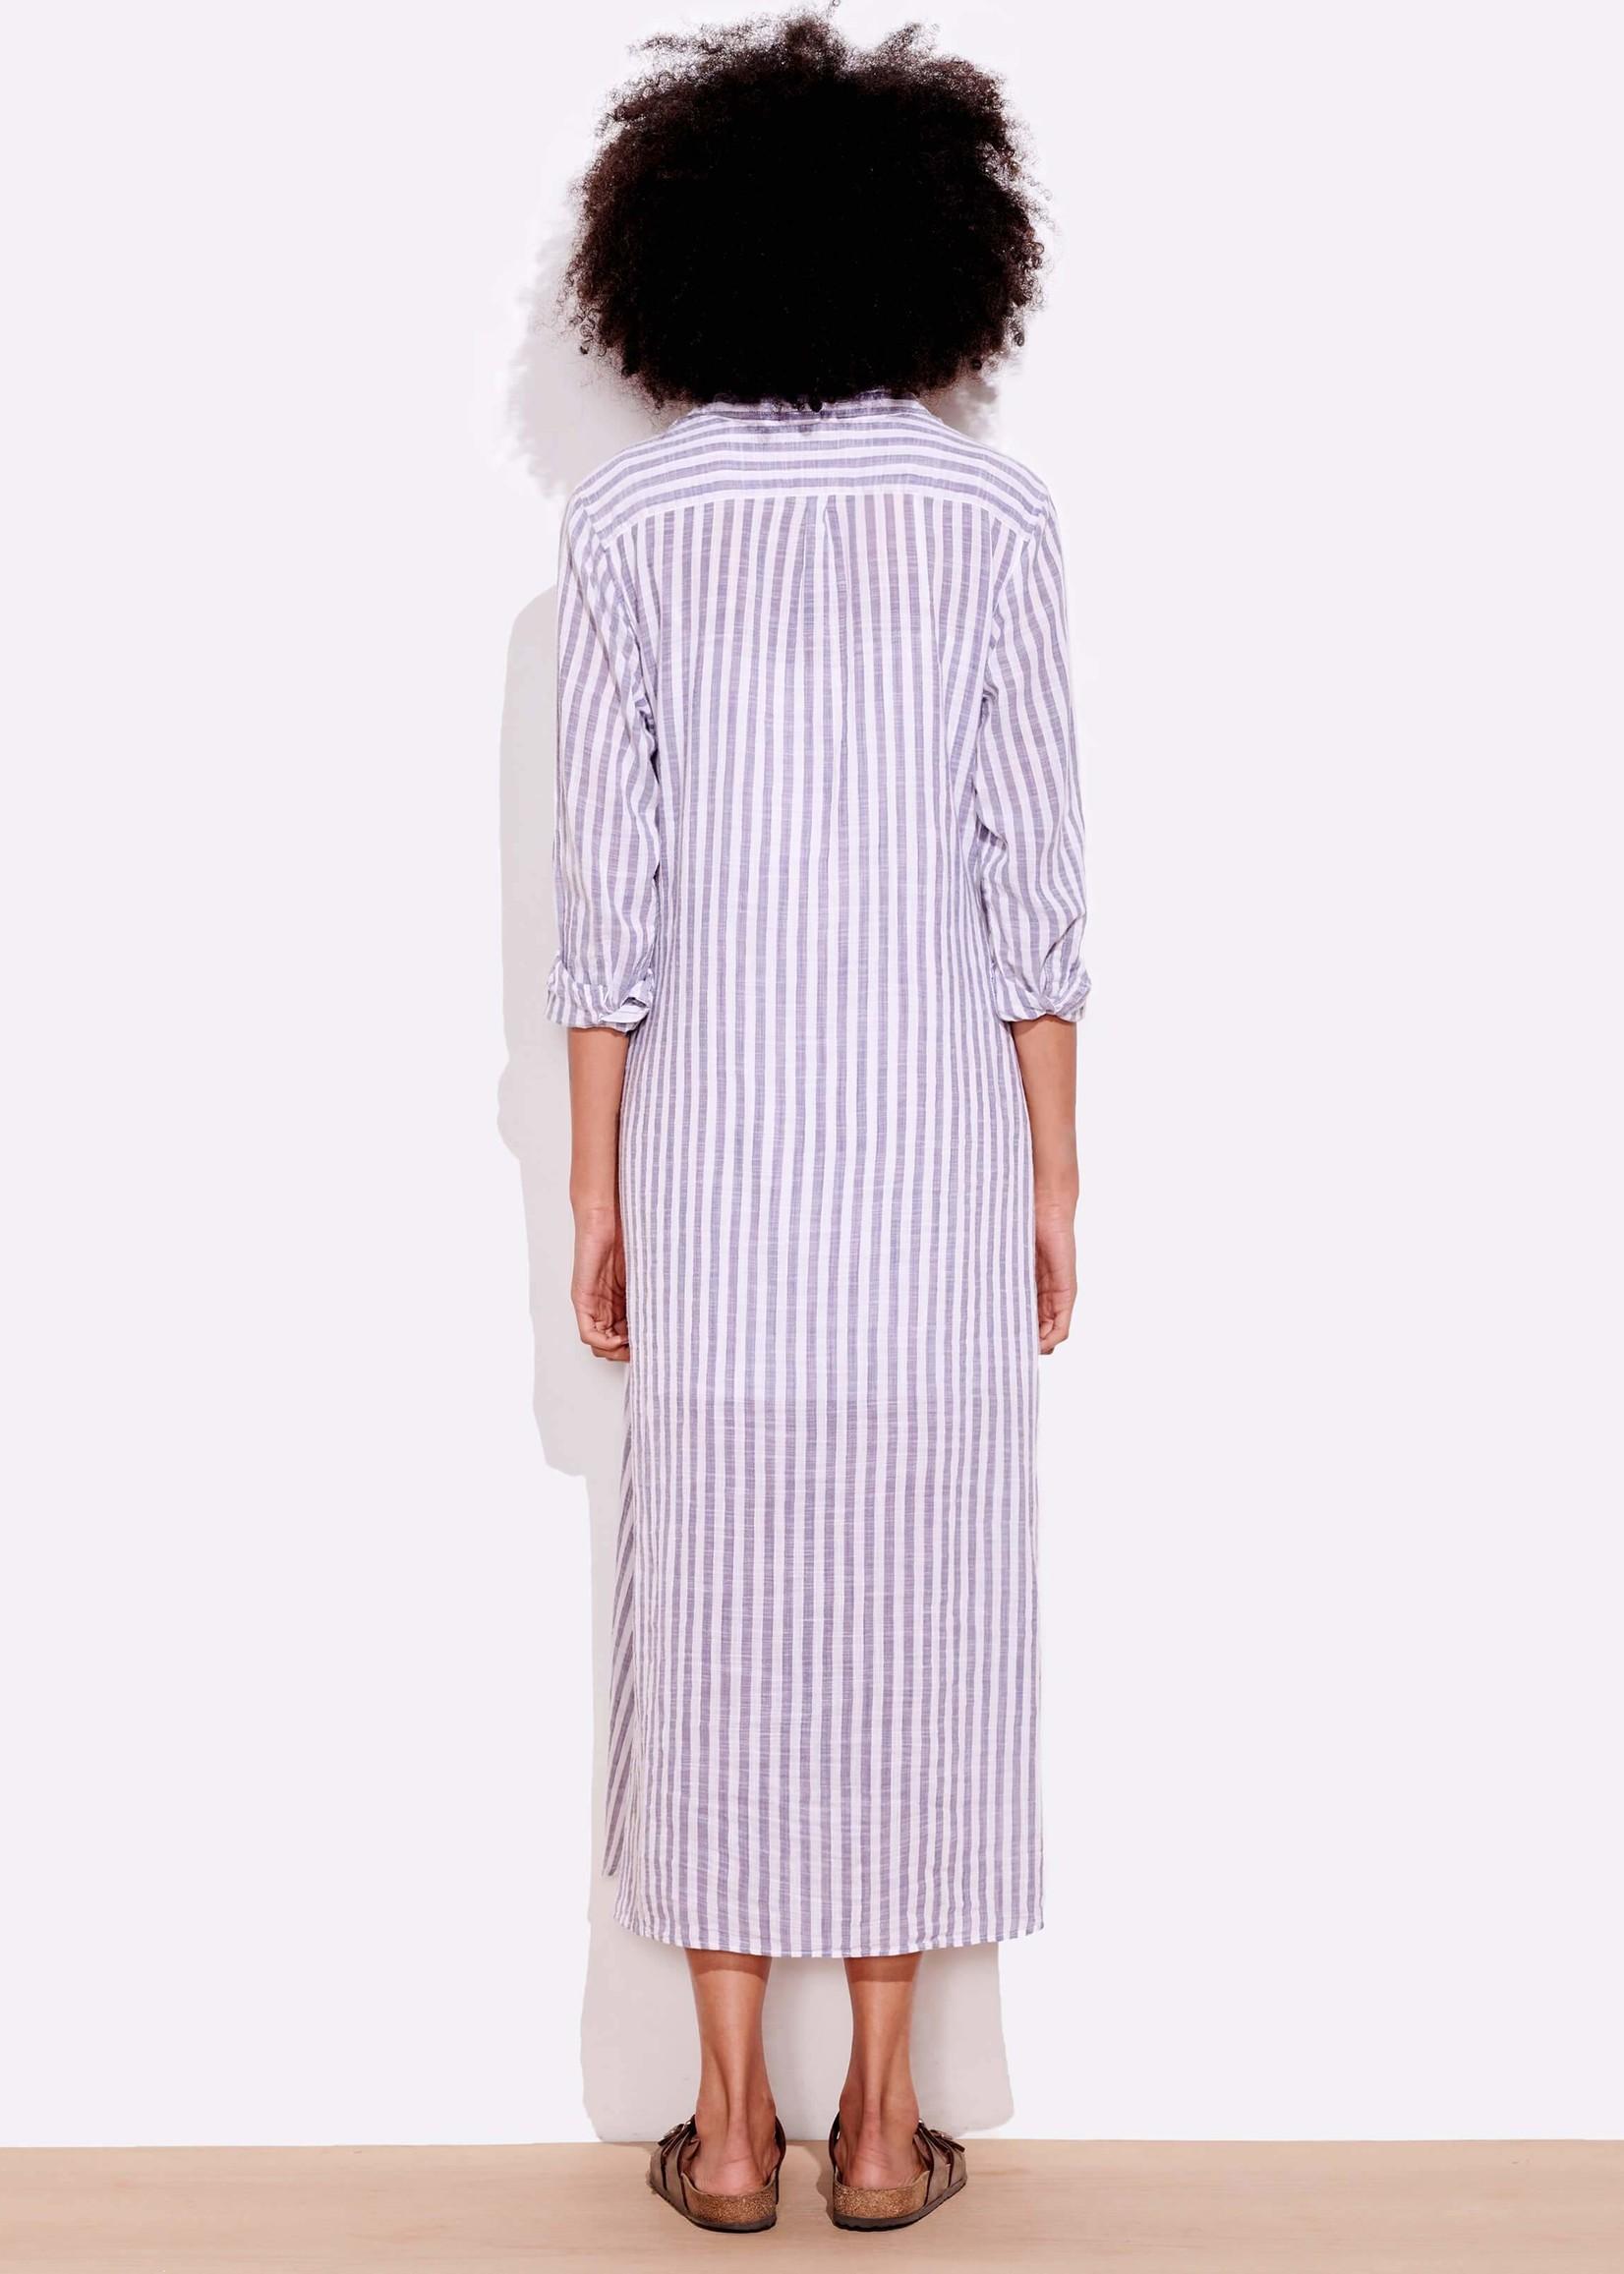 SUNDRY STRIPE SHIRT DRESS